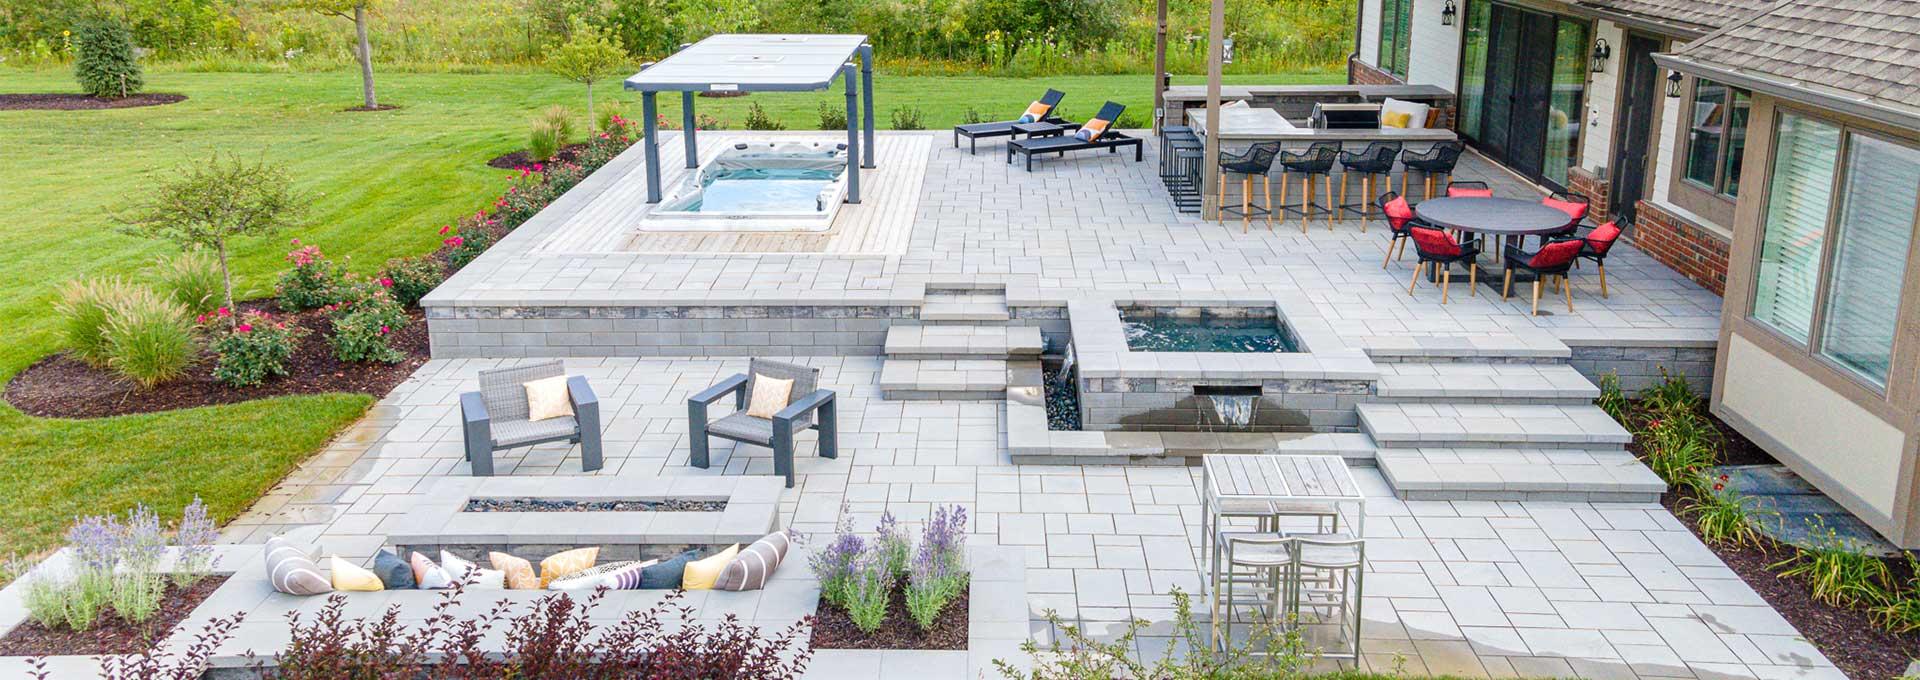 Landscape Design and Build Sales